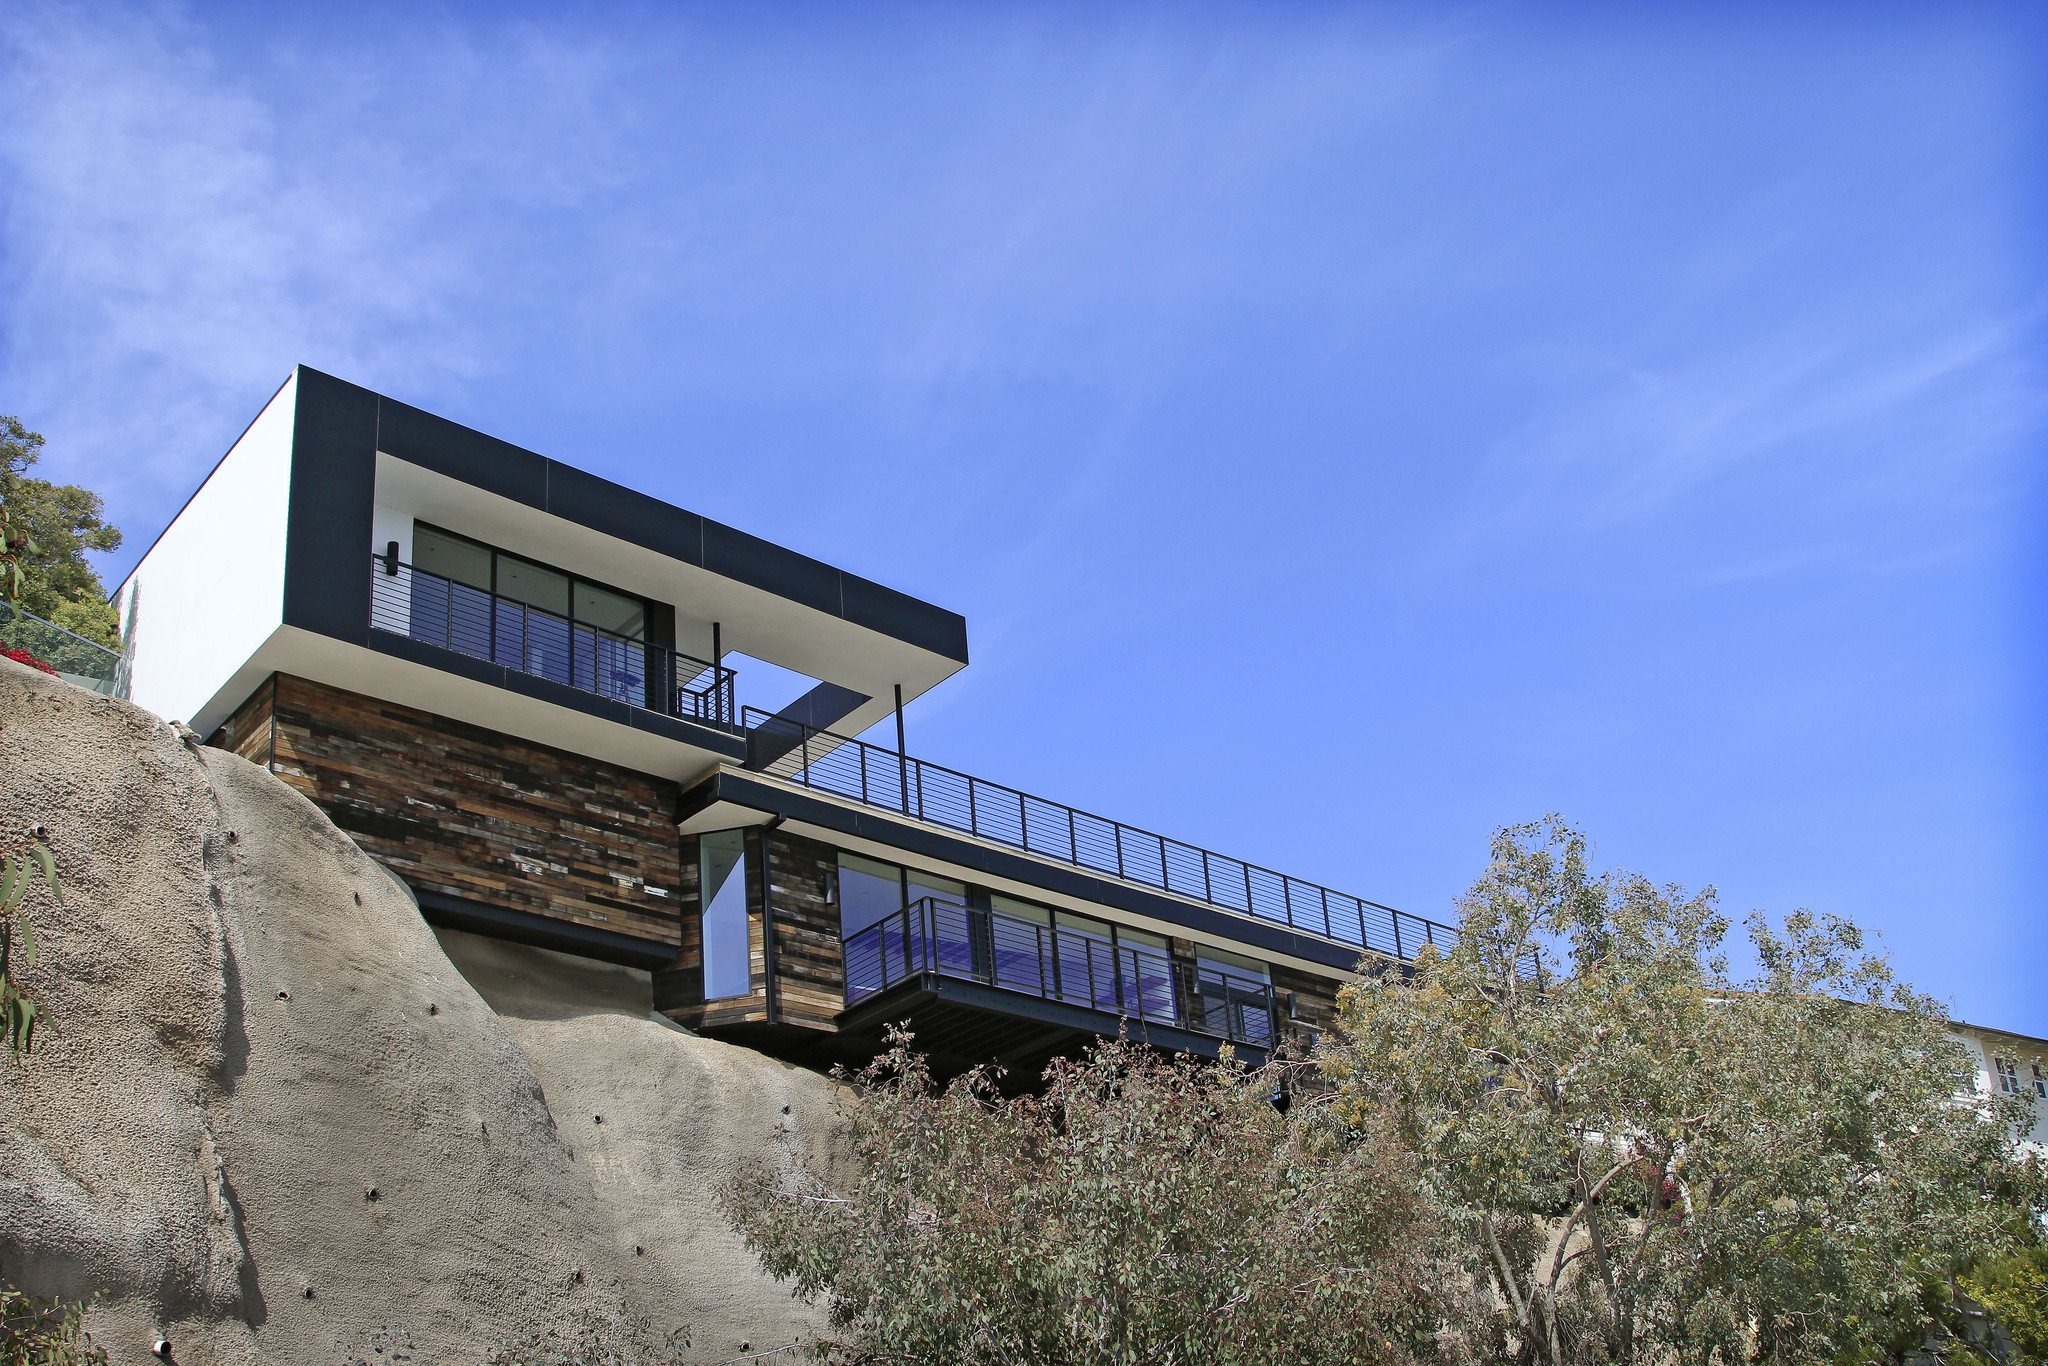 Modern new malibu house life on the edge la times for Modern malibu homes